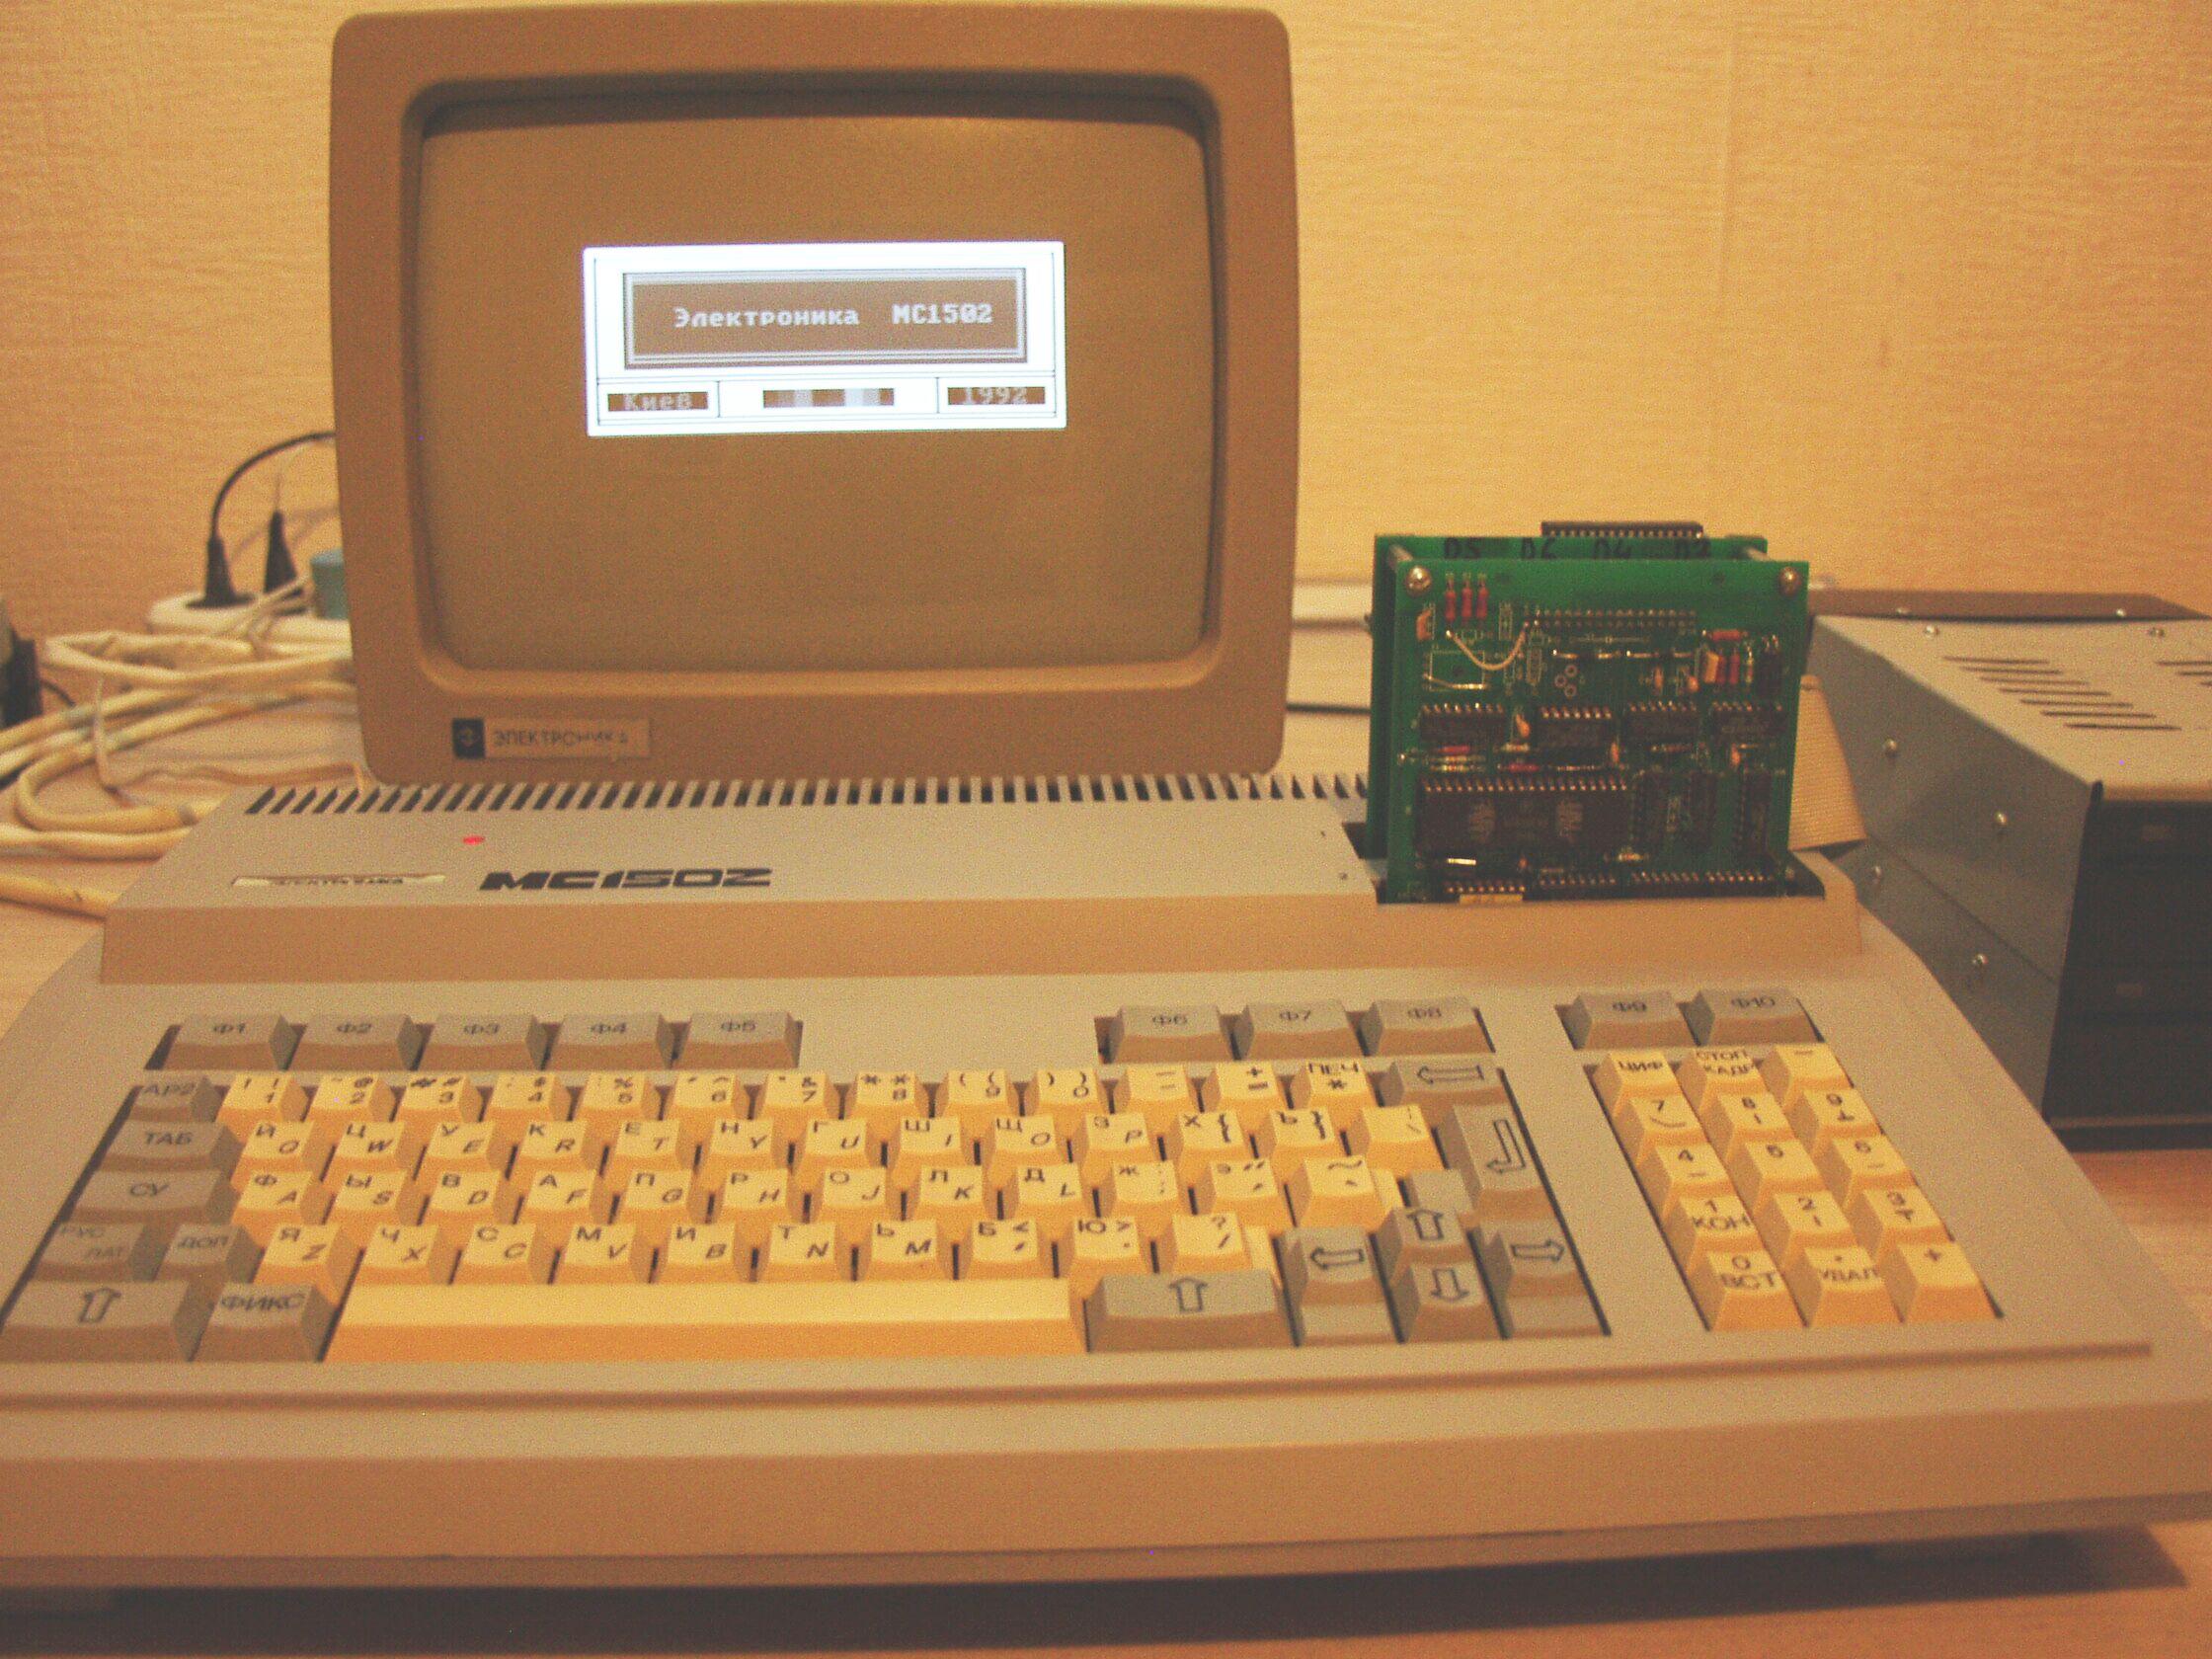 Советская IBM-PC Электроника МС-1502 - 11